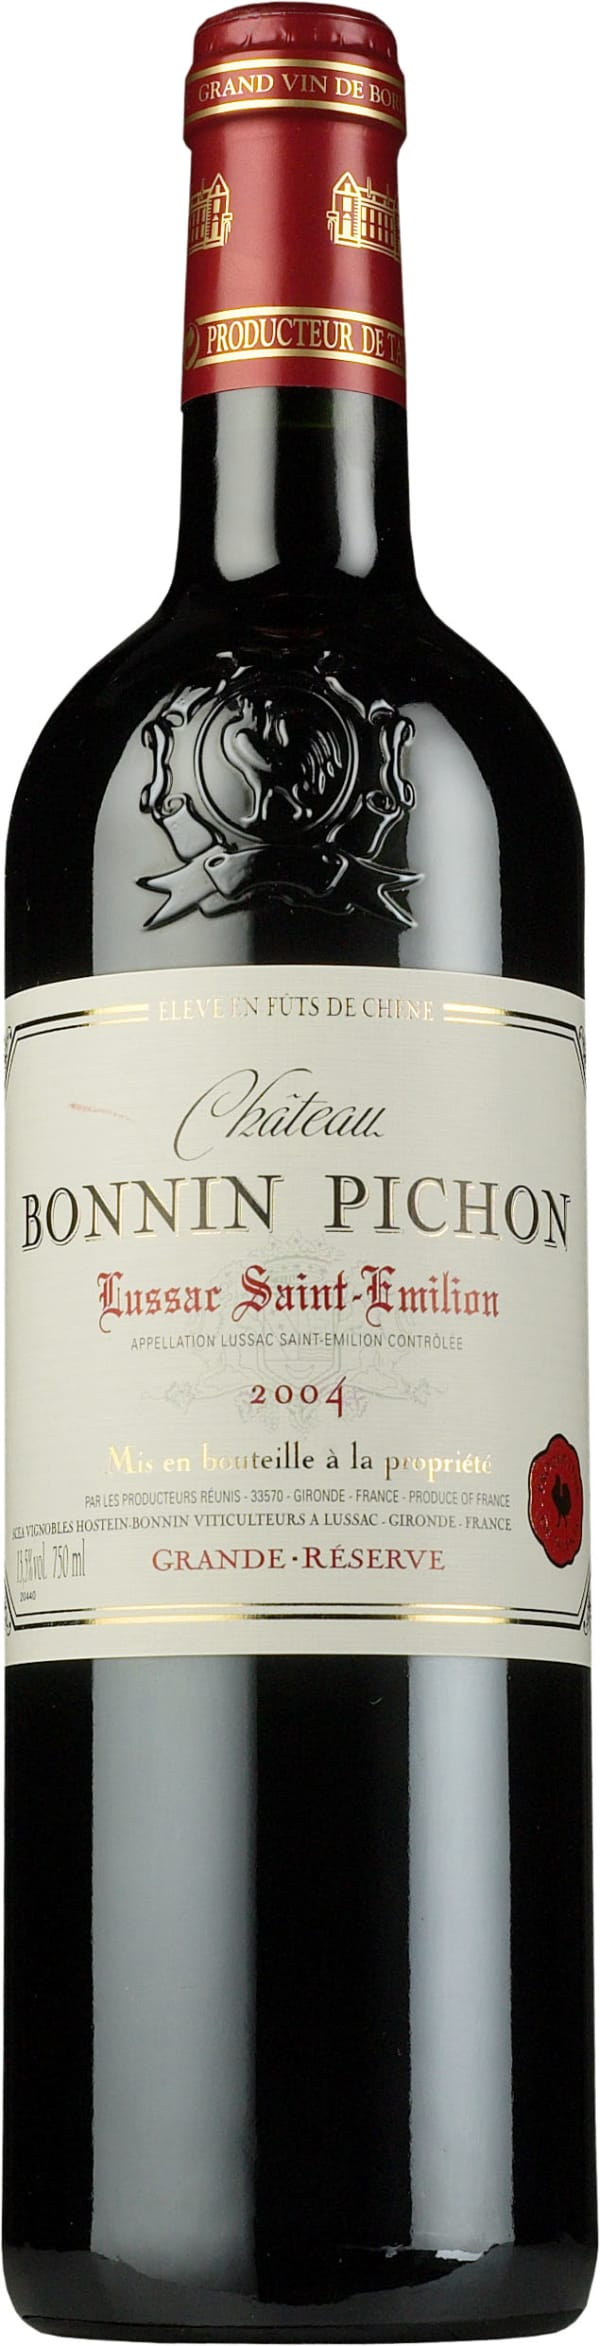 Château Bonnin Pichon 2015